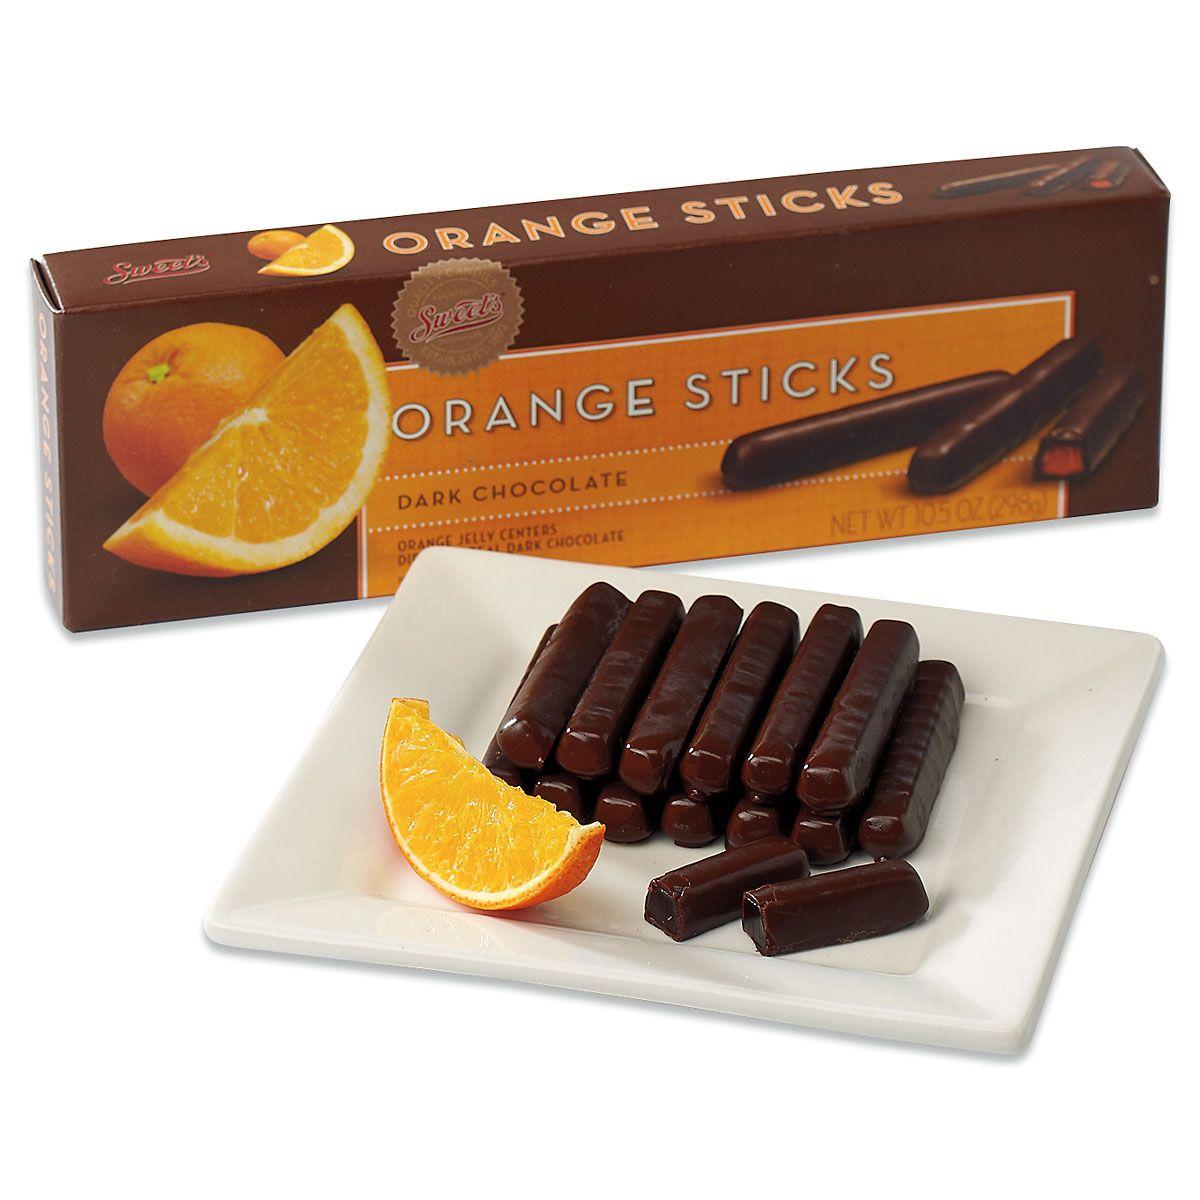 Gourmet Dark Chocolate Orange Sticks